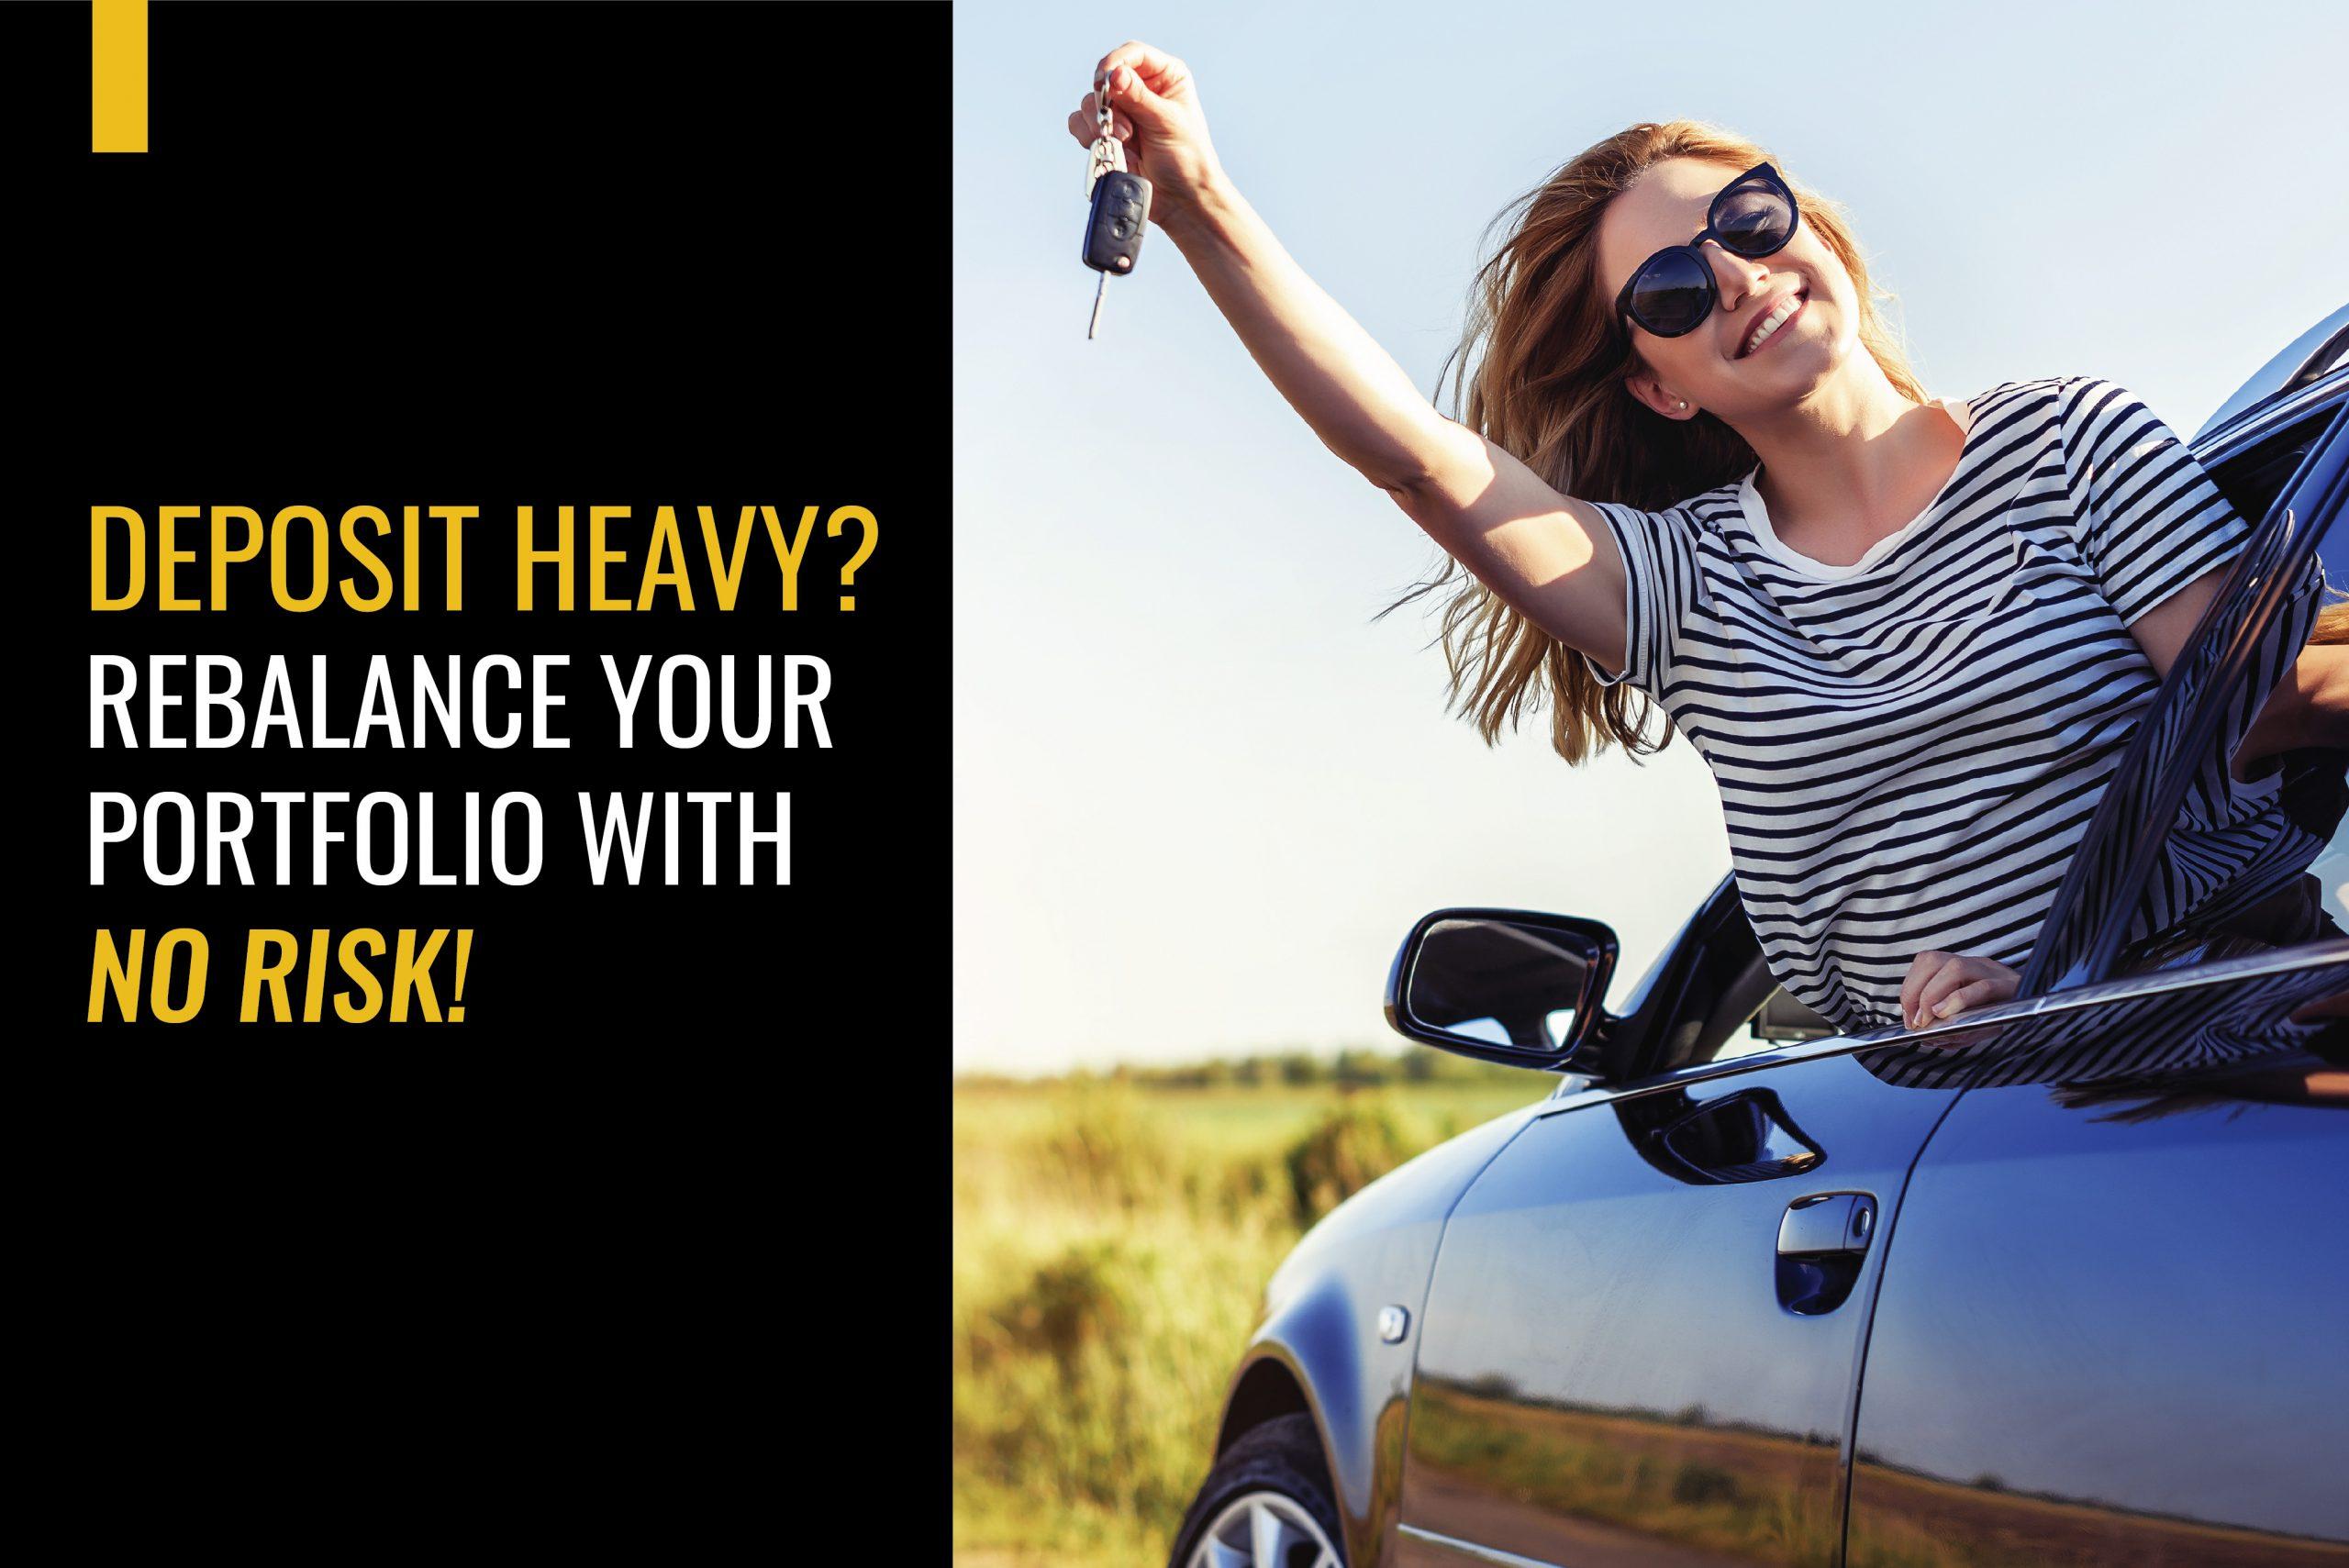 Deposit Heavy? Rebalance your Portfolio with no risk!